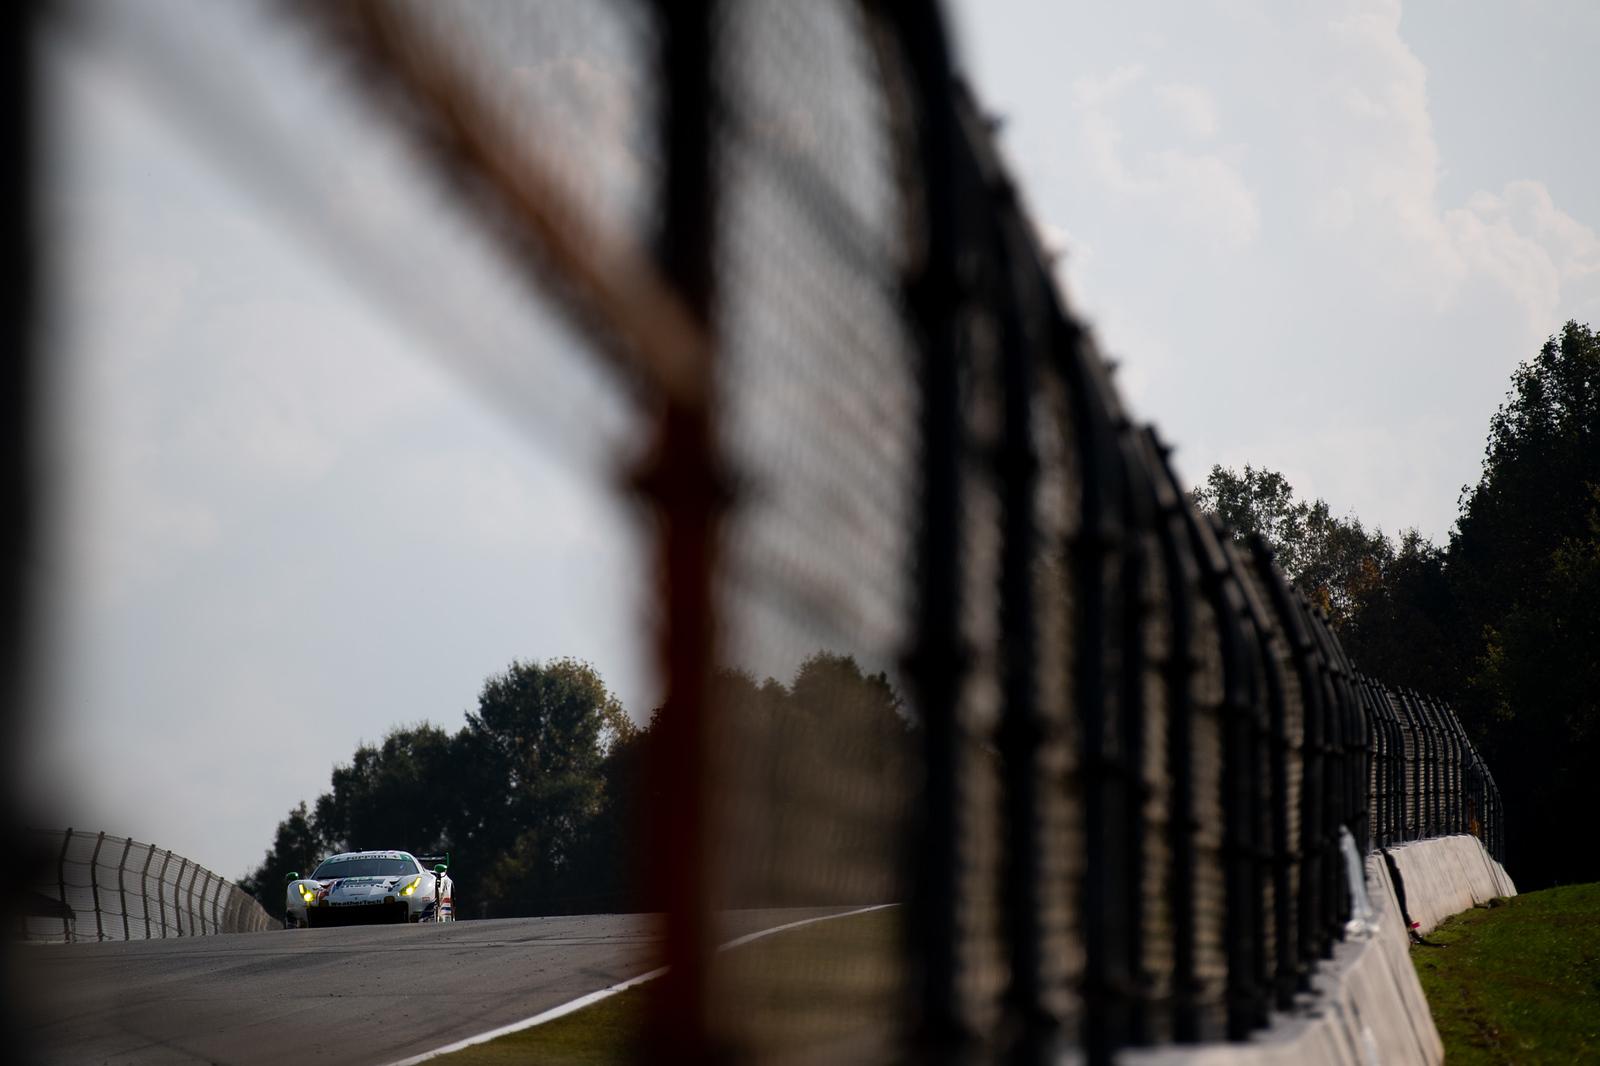 Ferrari in the distance.